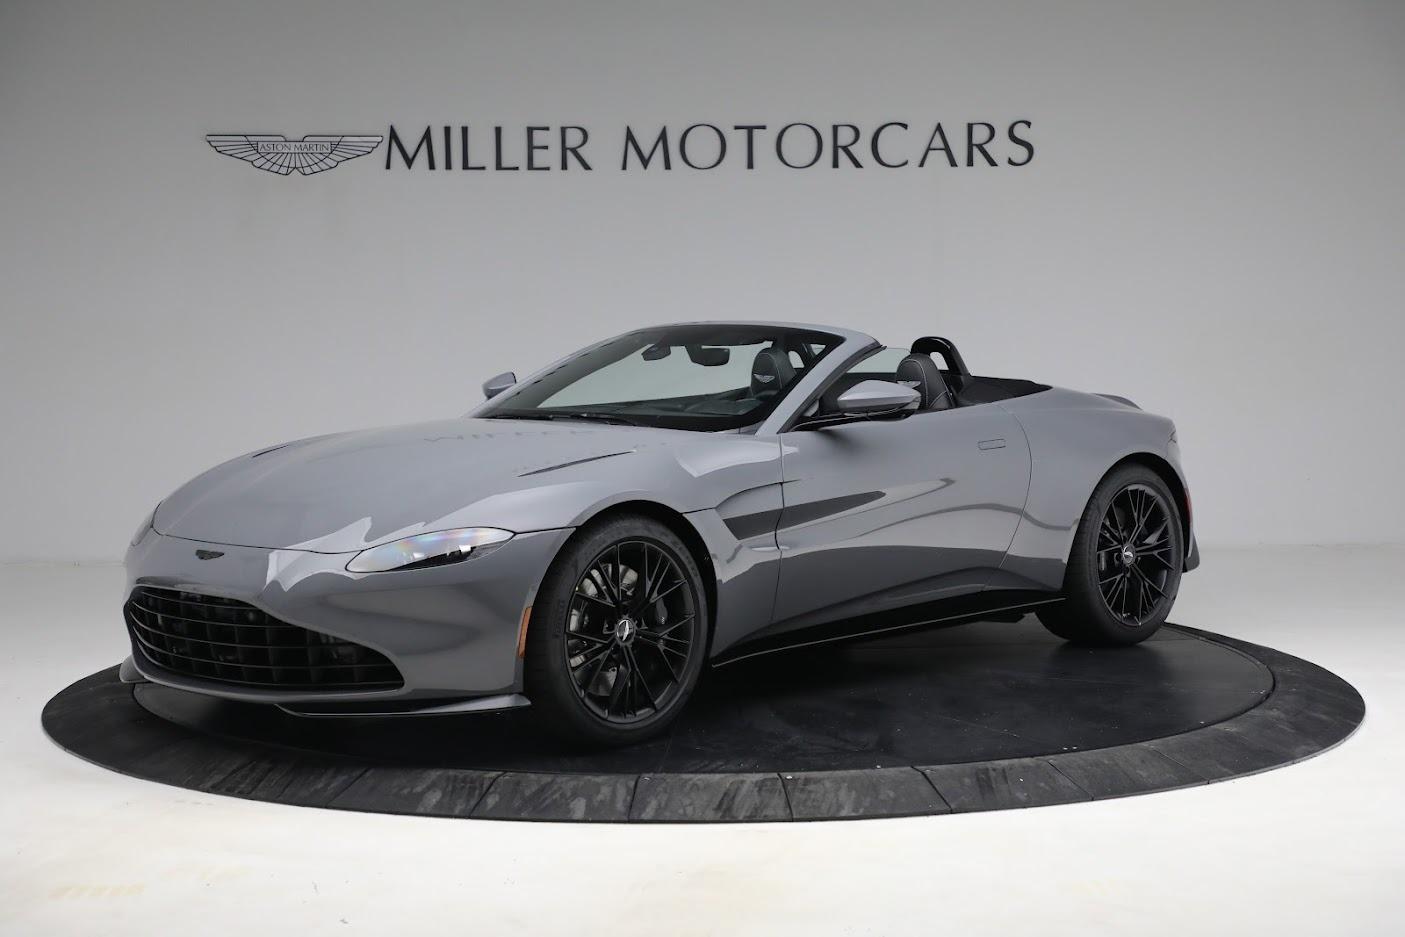 New 2021 Aston Martin Vantage Roadster for sale $180,286 at Alfa Romeo of Westport in Westport CT 06880 1